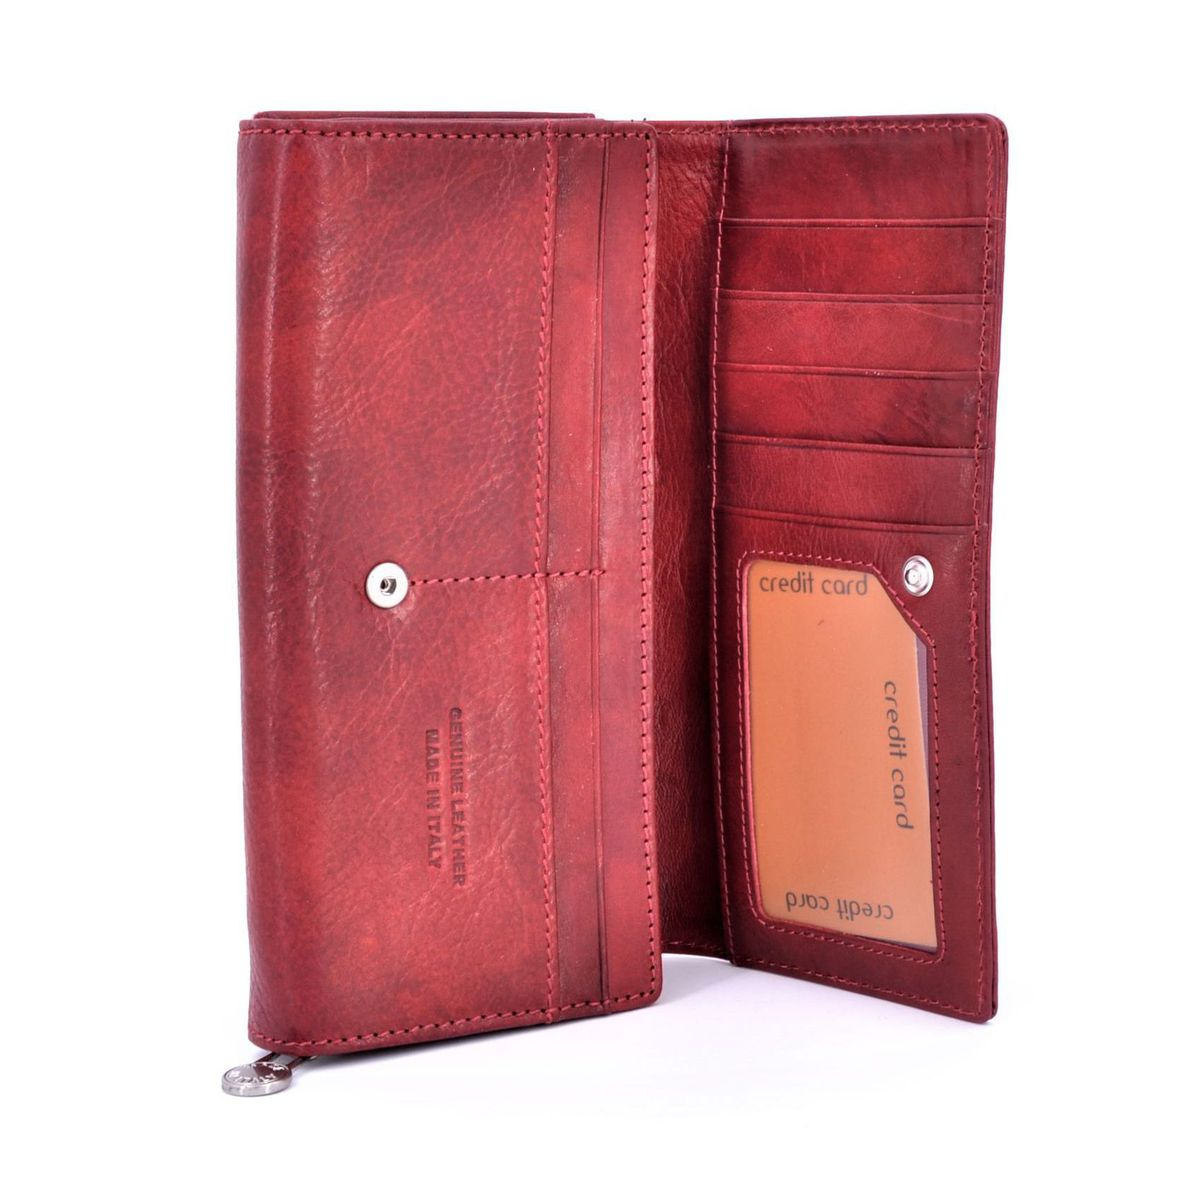 Women's leather button wallet Red BRASS Workshop